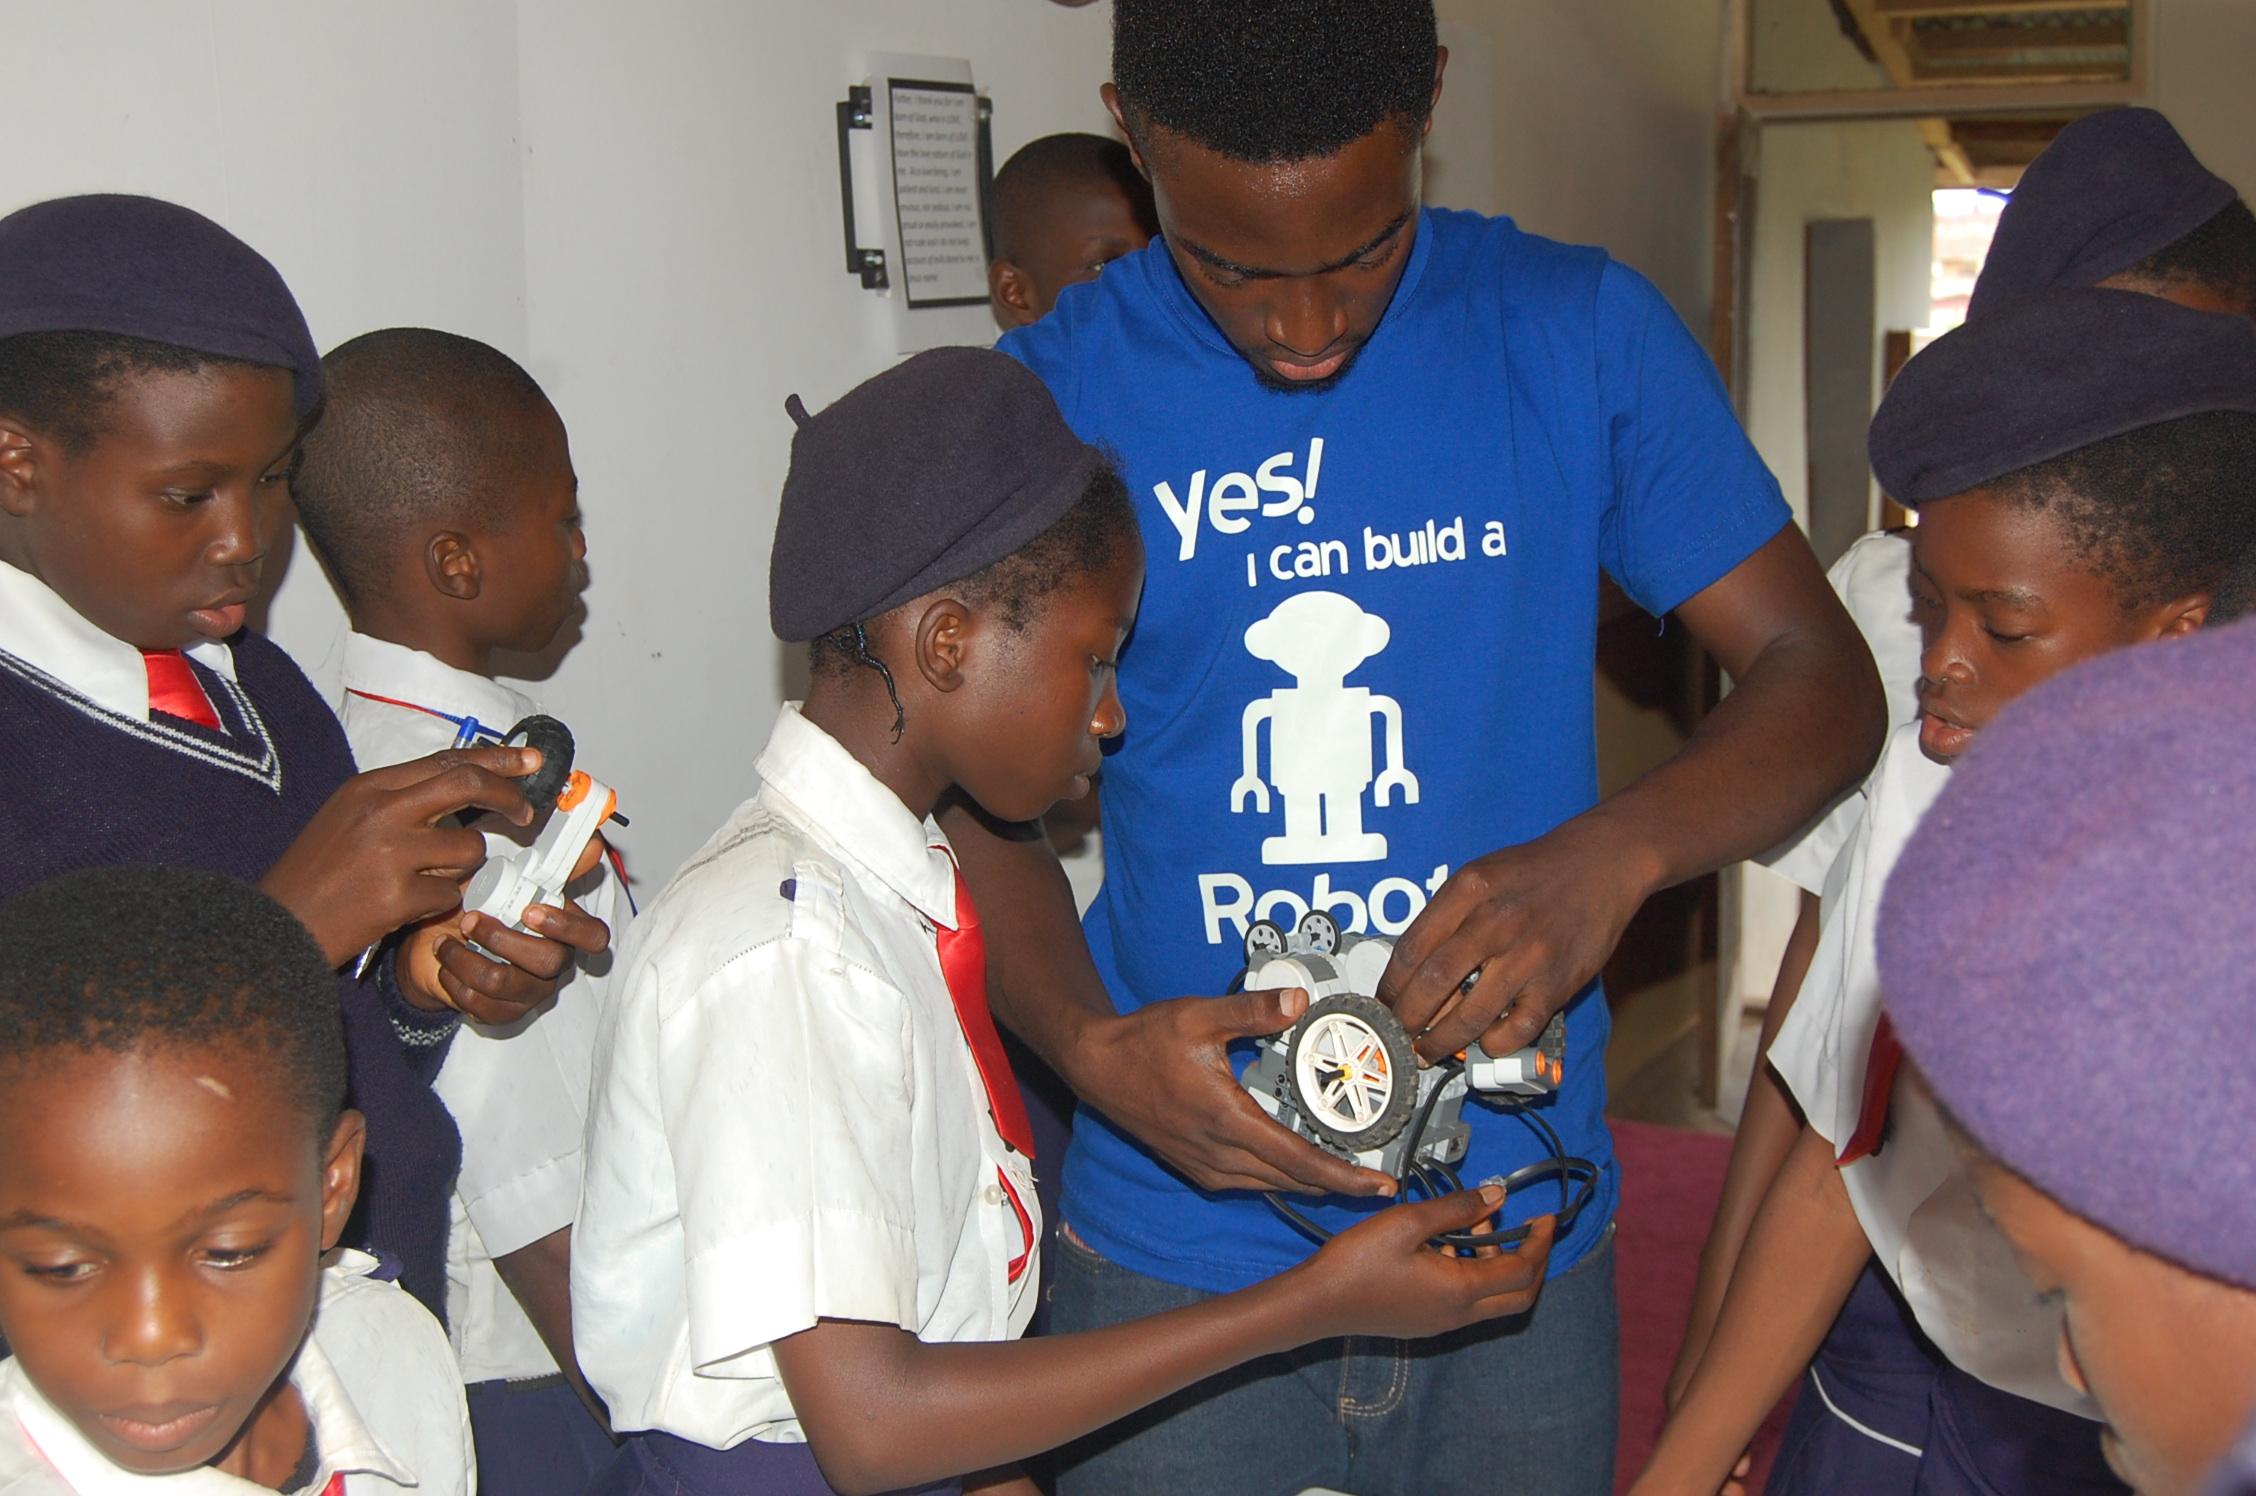 Welcome to Nigeria's robot school!